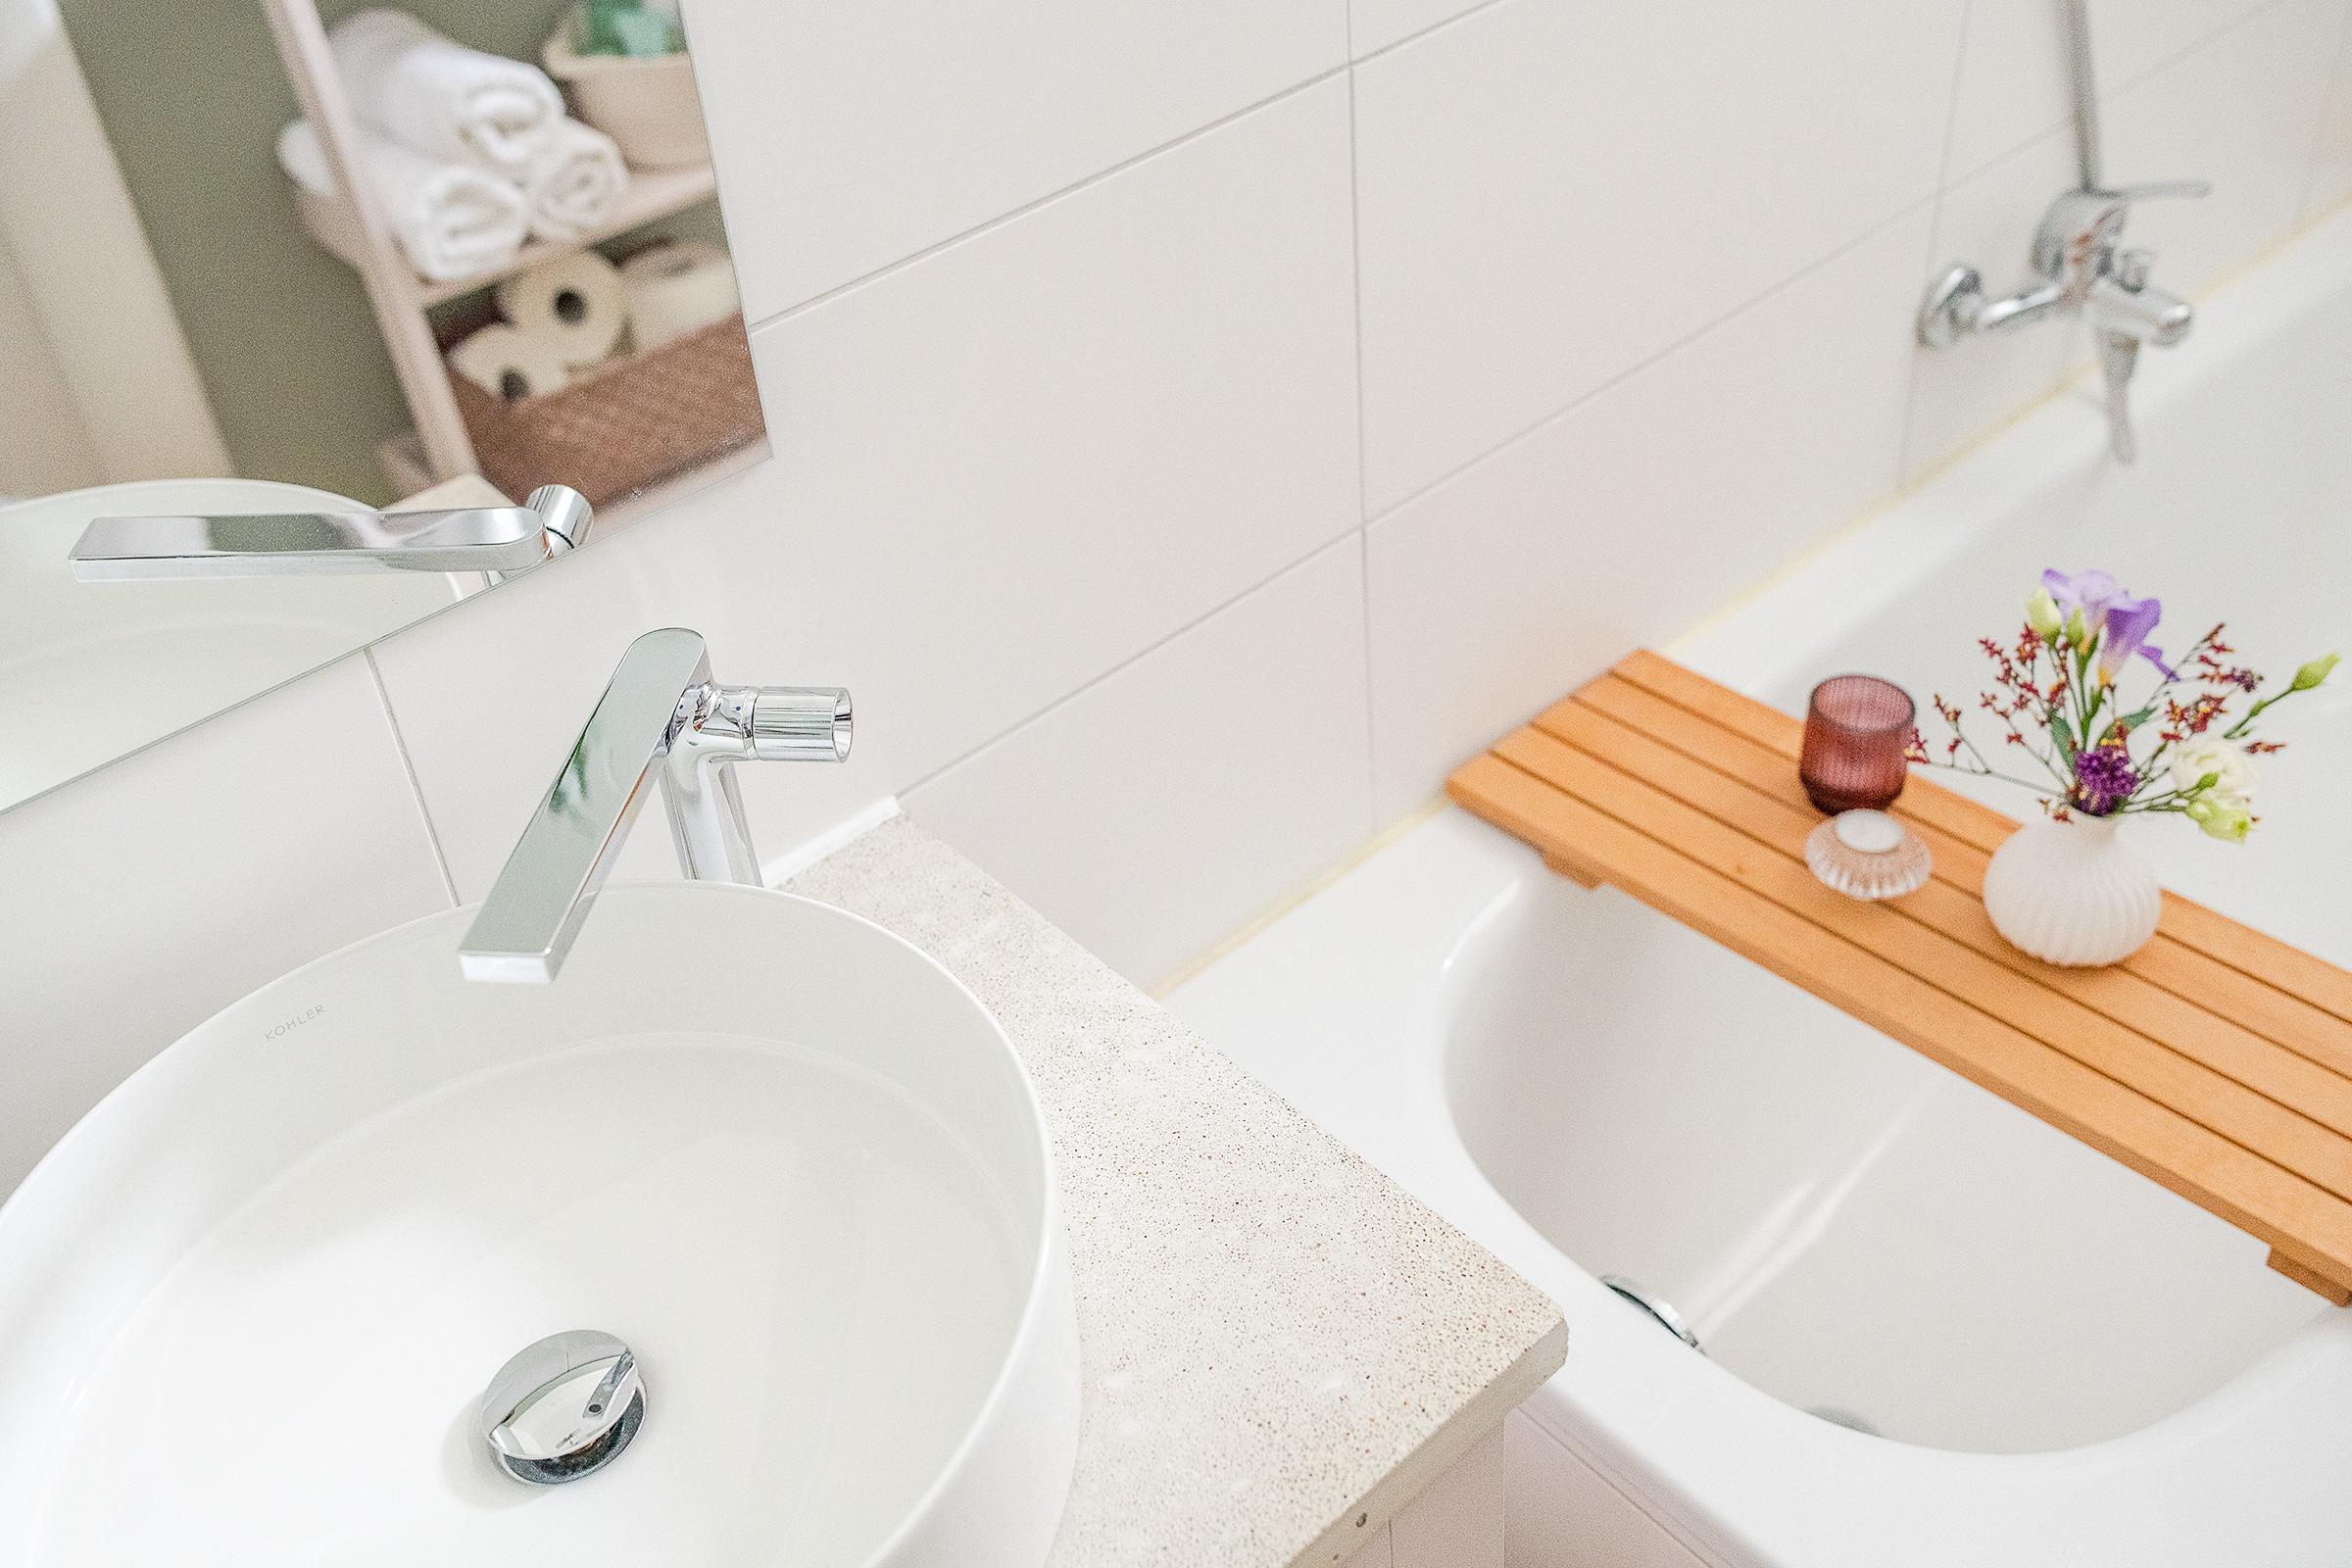 Bathroom Updates With Concrete Countertop and Kohler Composed Tap & Kohler Mica Washbasin | Little House On The Corner